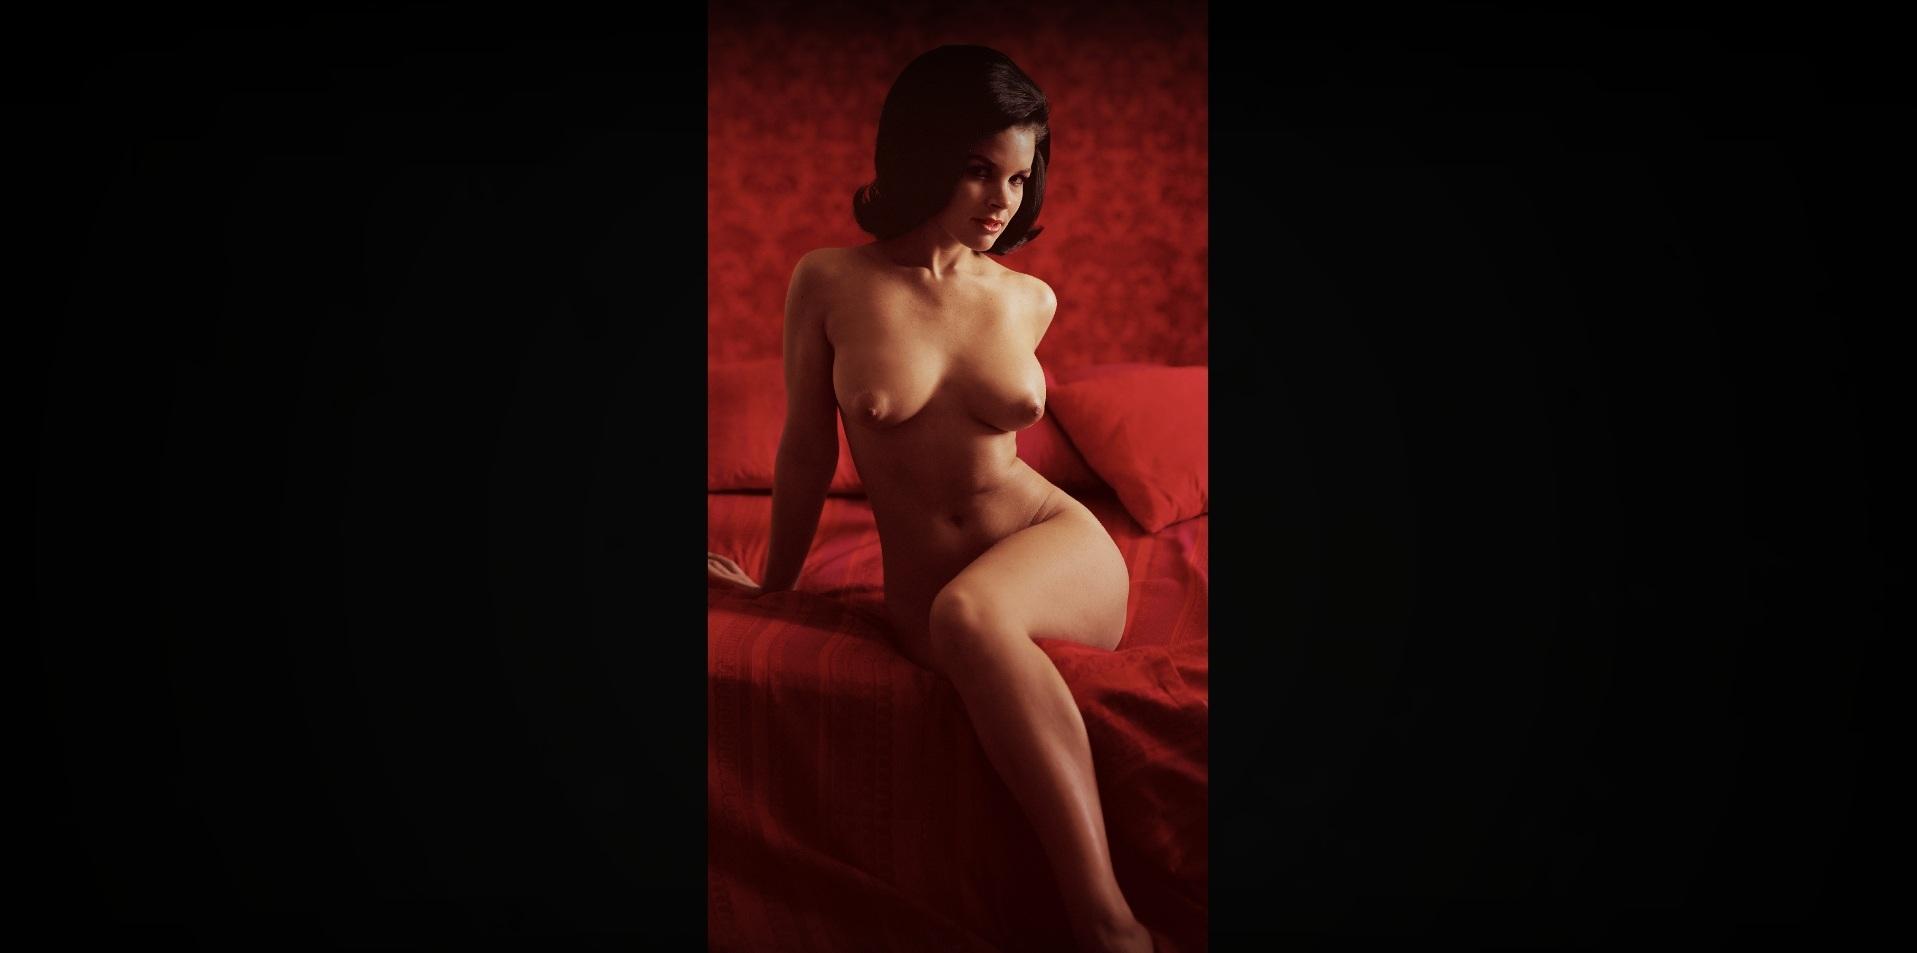 Jan Roberts Playboy 1962 - Hot Girls Wallpaper